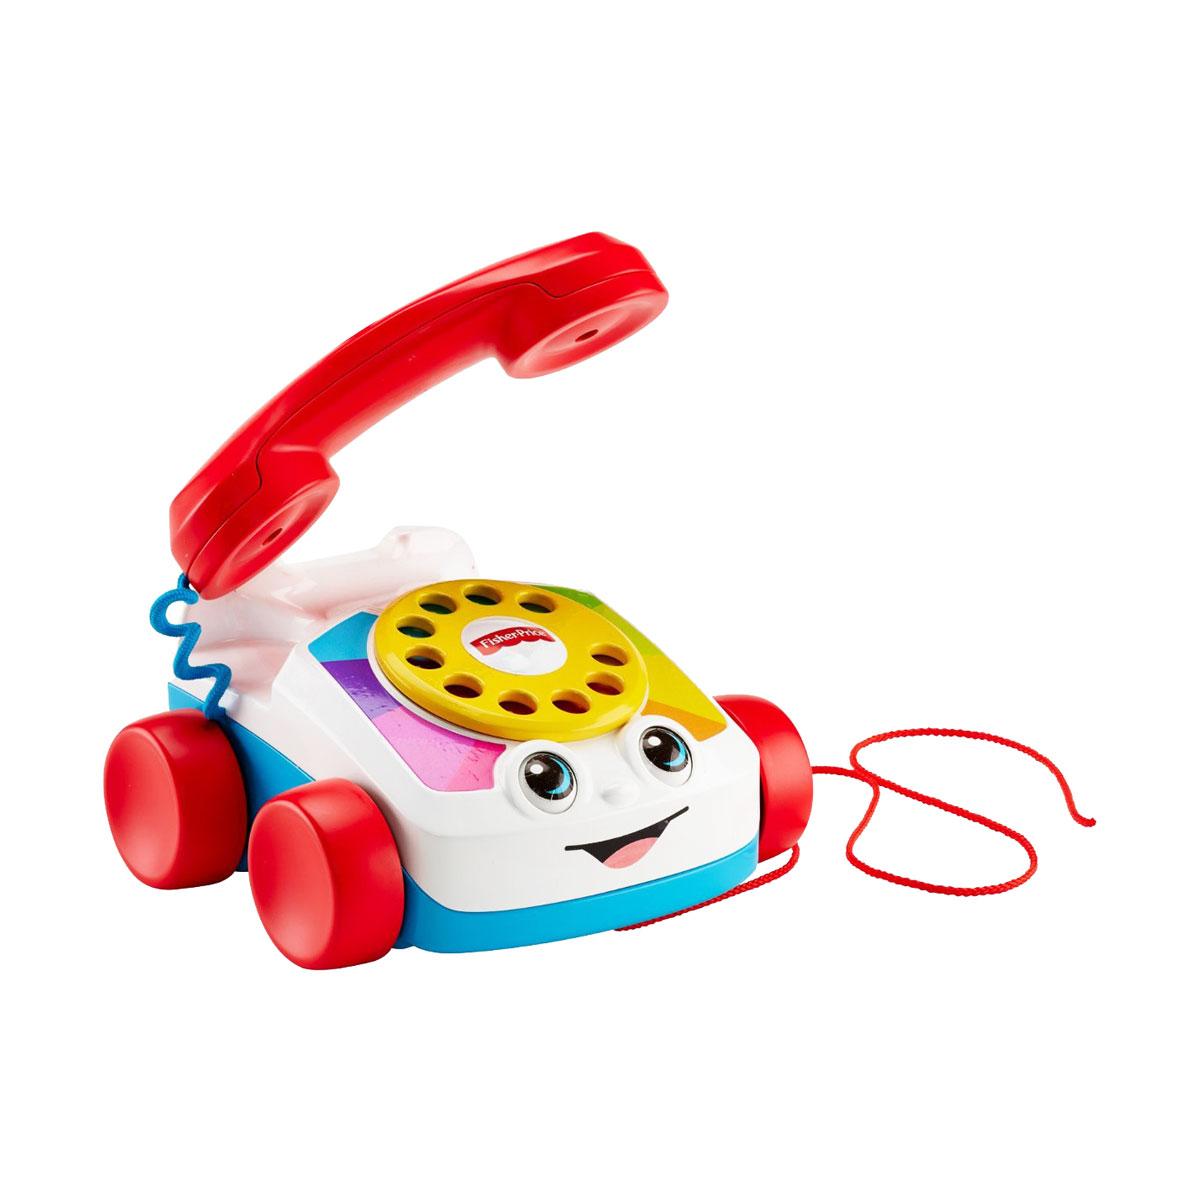 Игрушка Fisher Price Говорящий телефон на колесах<br>